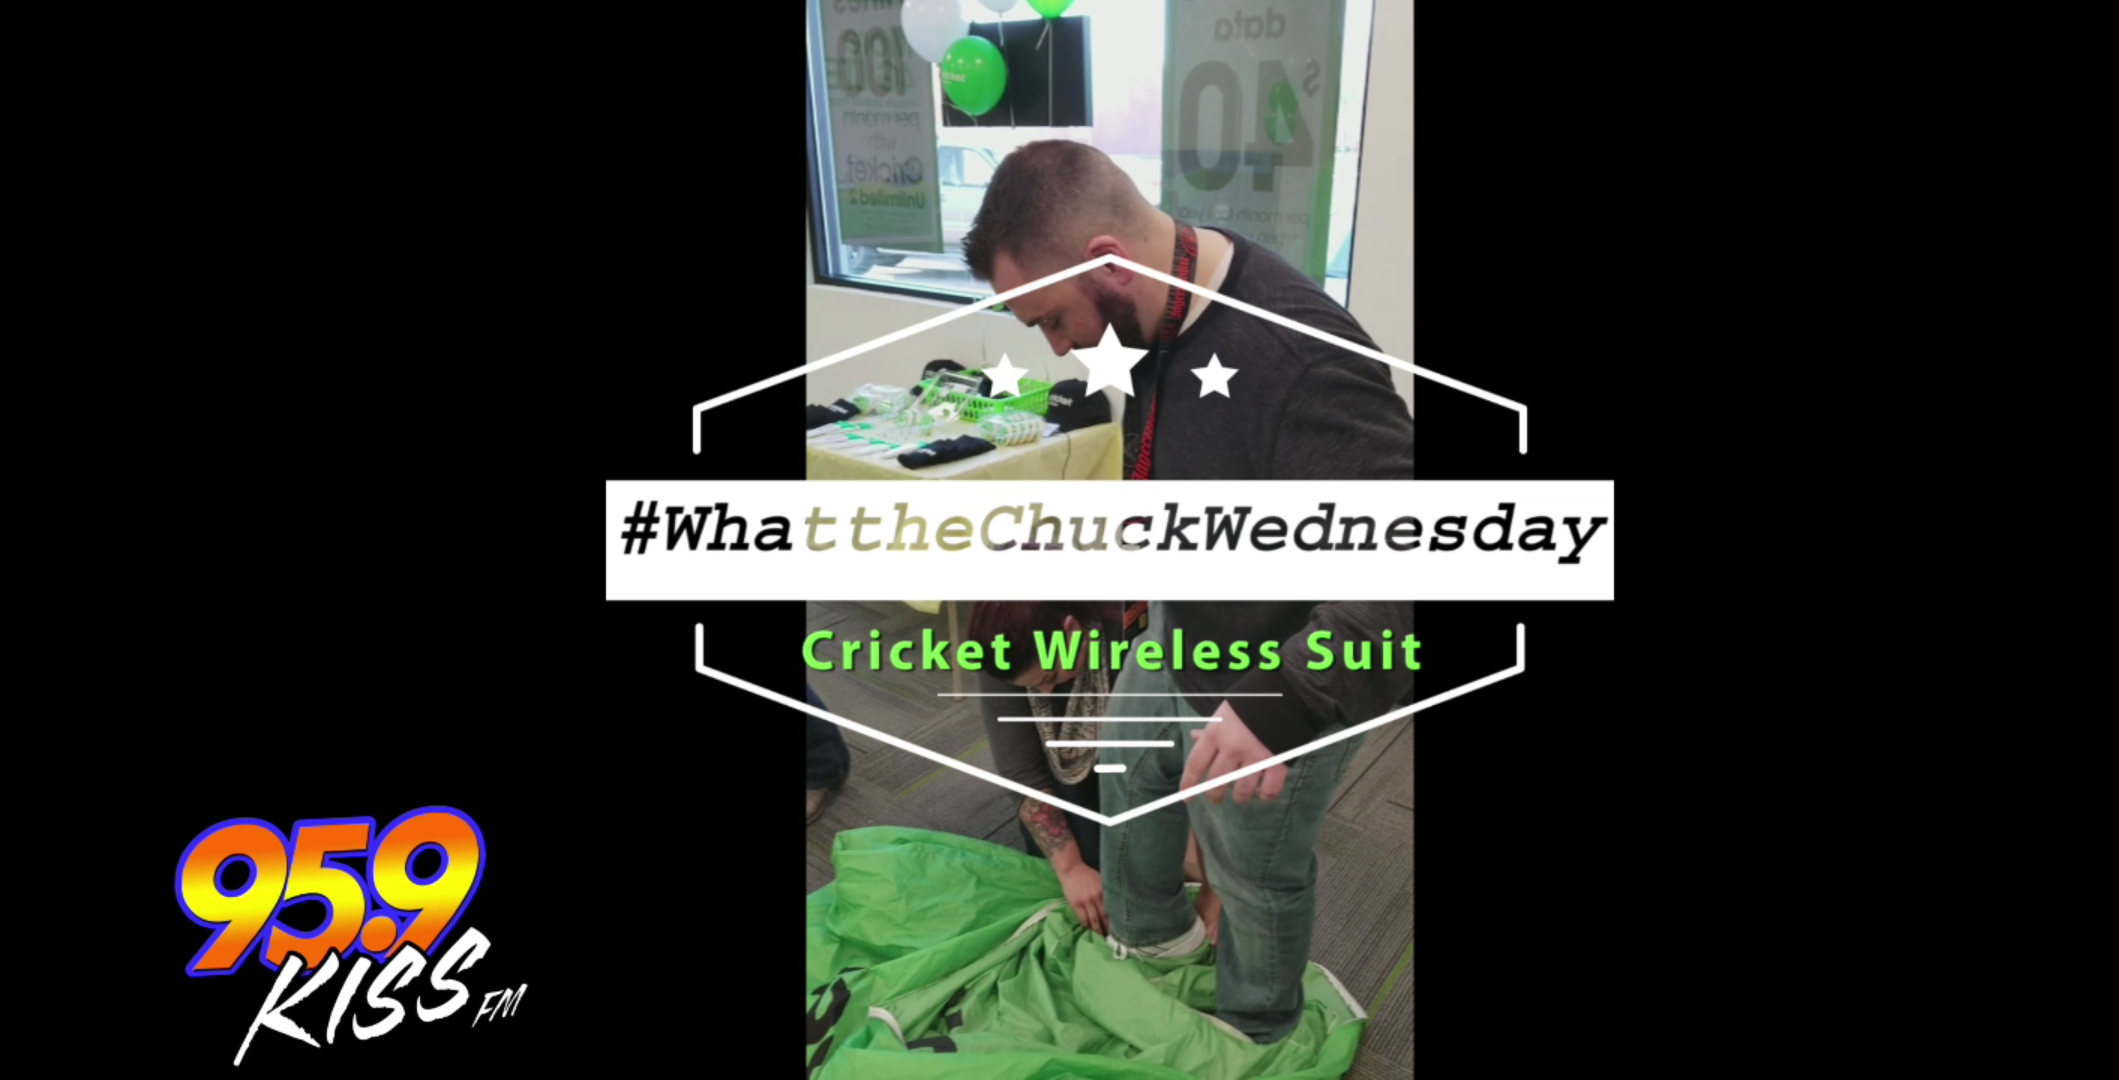 #WhattheChuckWednesday - Cricket Wireless Suit